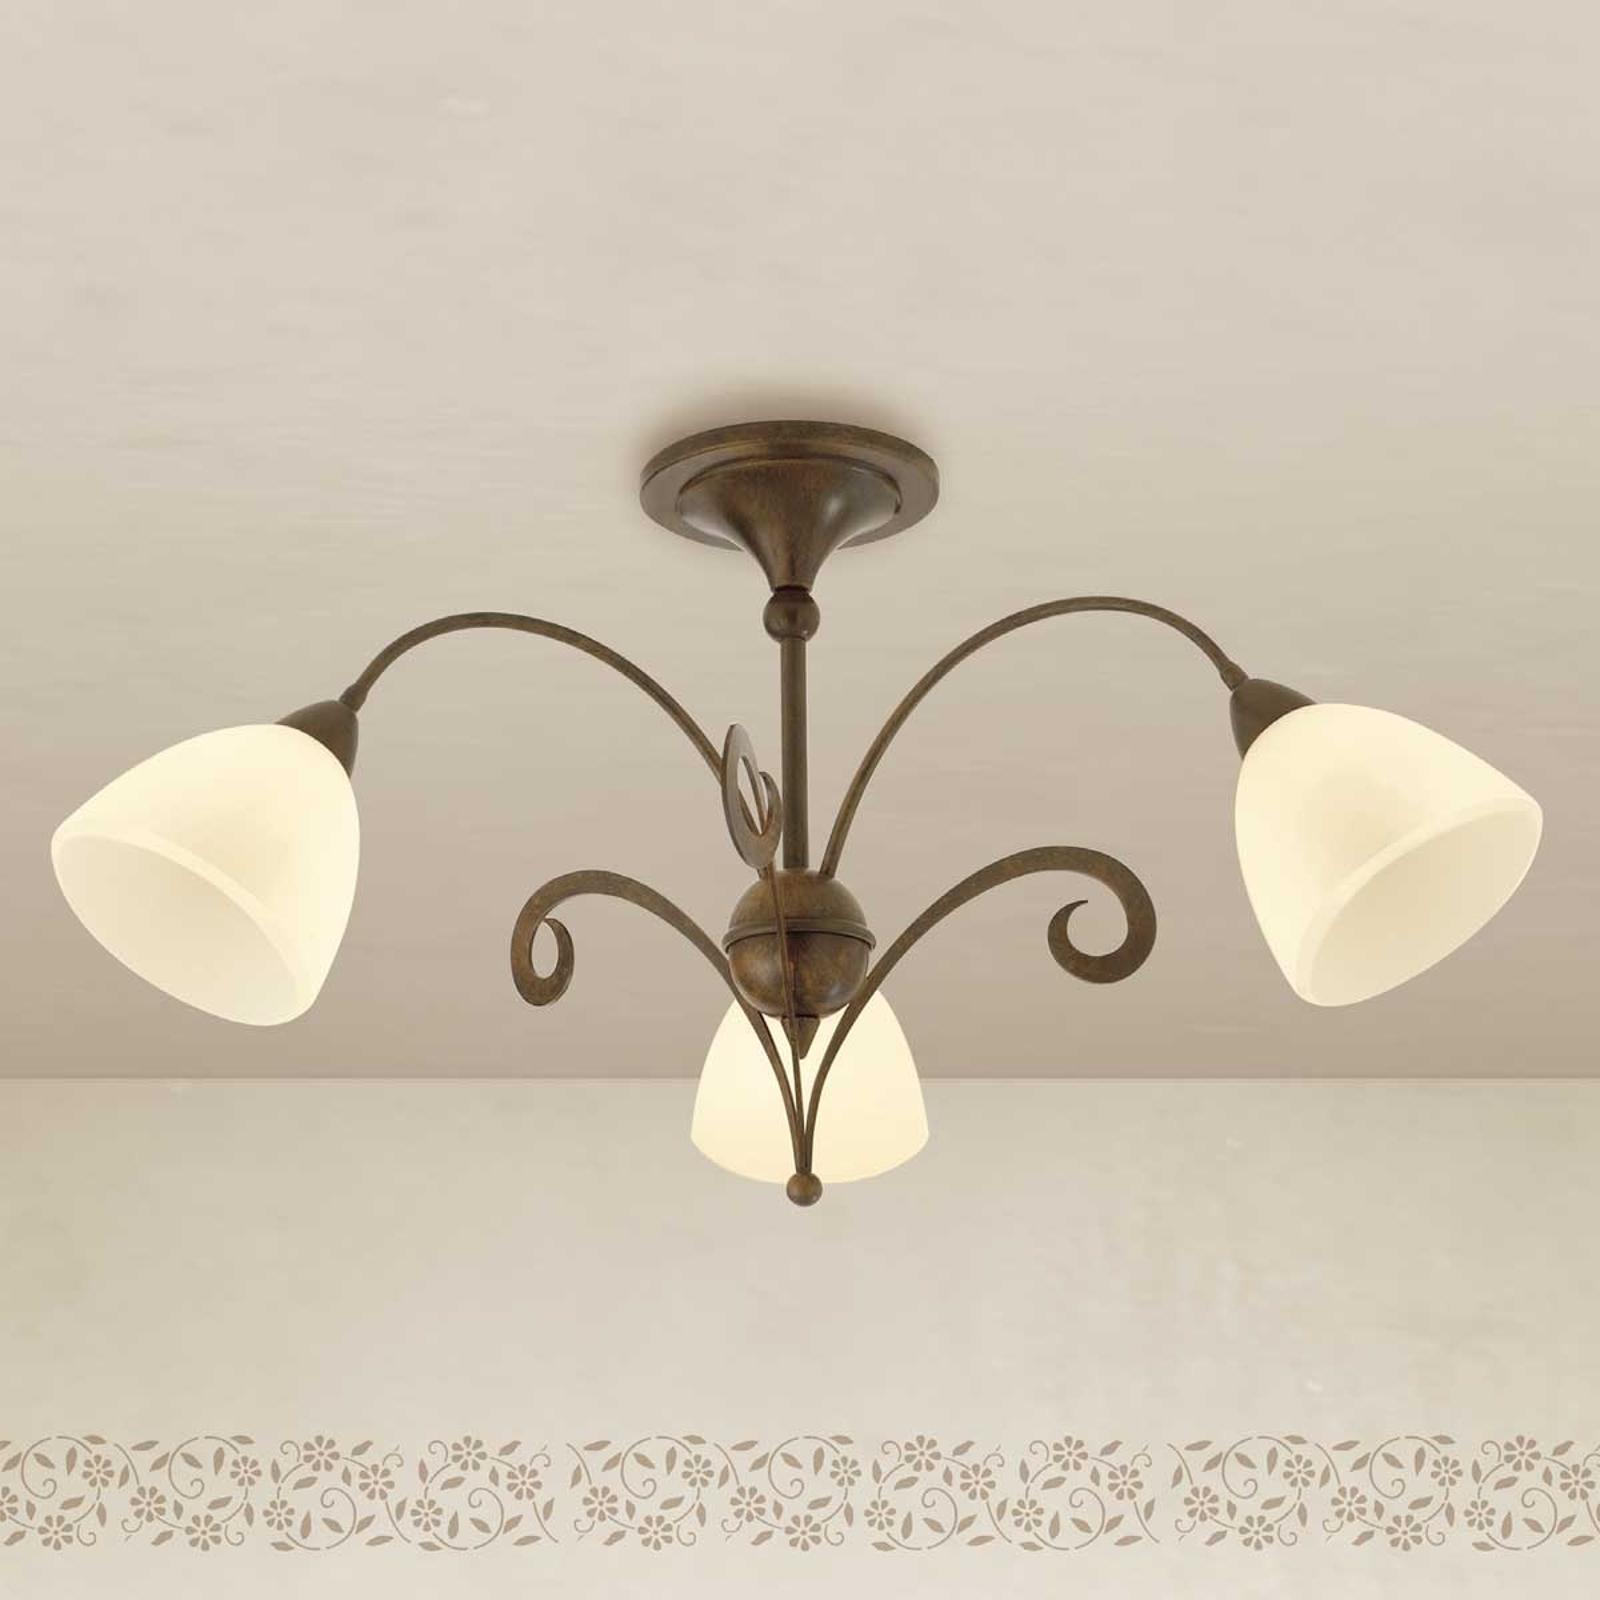 Deckenlampe Luca im Landhaus-Design, 3-fl.